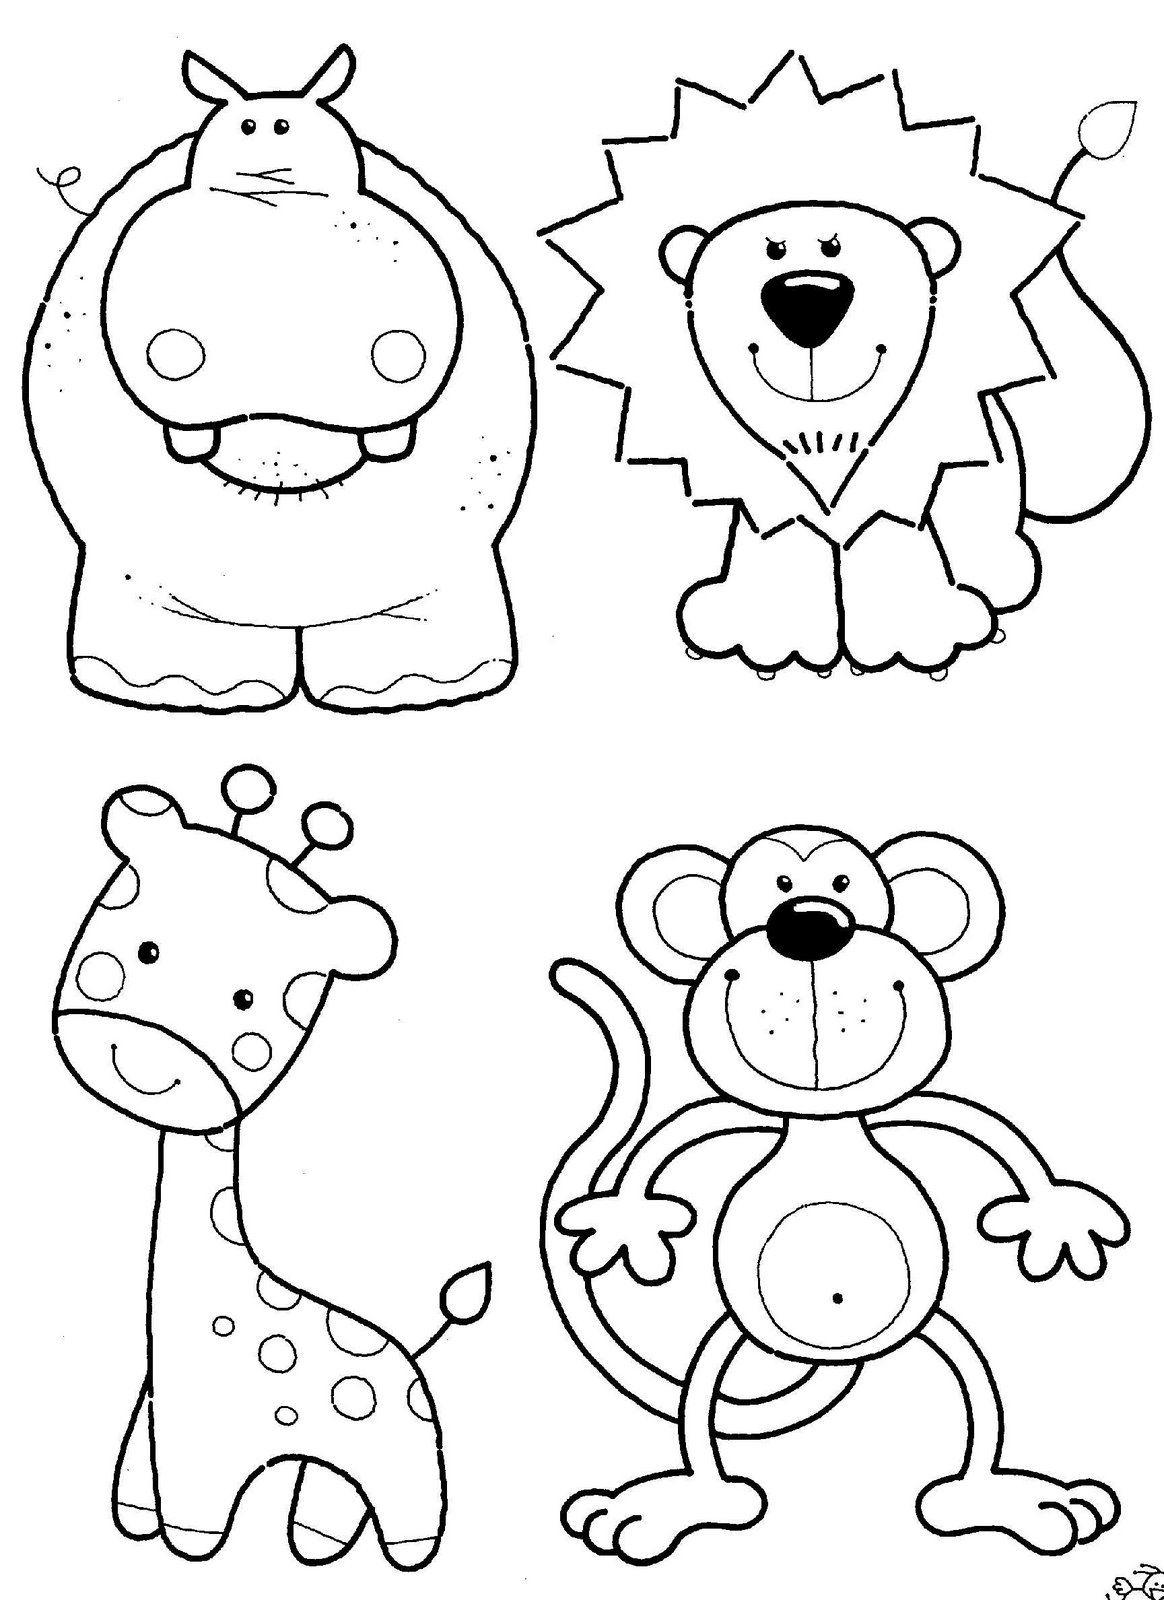 Free Printable Coloring Pages Preschoolers   Coloring Pages Animals - Free Printable Coloring Pages For Preschoolers